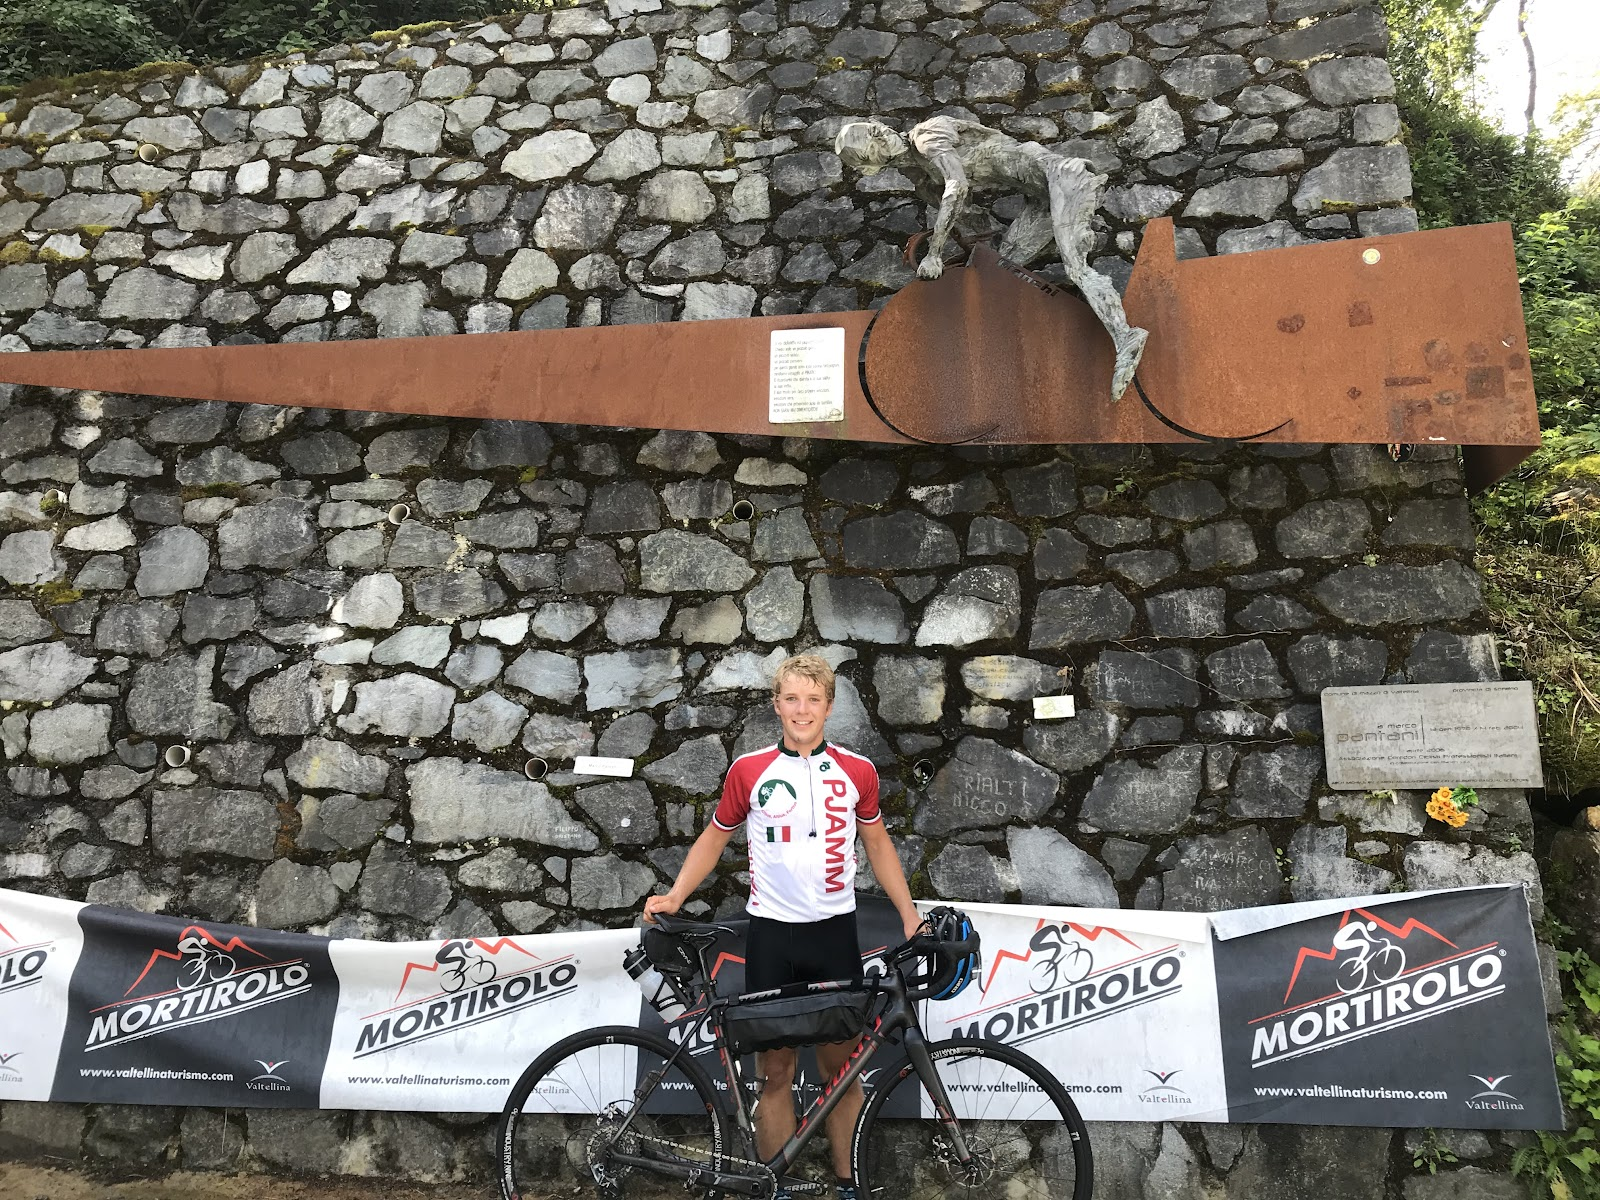 Cycling Passo del Mortirolo from Mazzo di Valtellina - PJAMM cyclists with bike at Pantani memorial